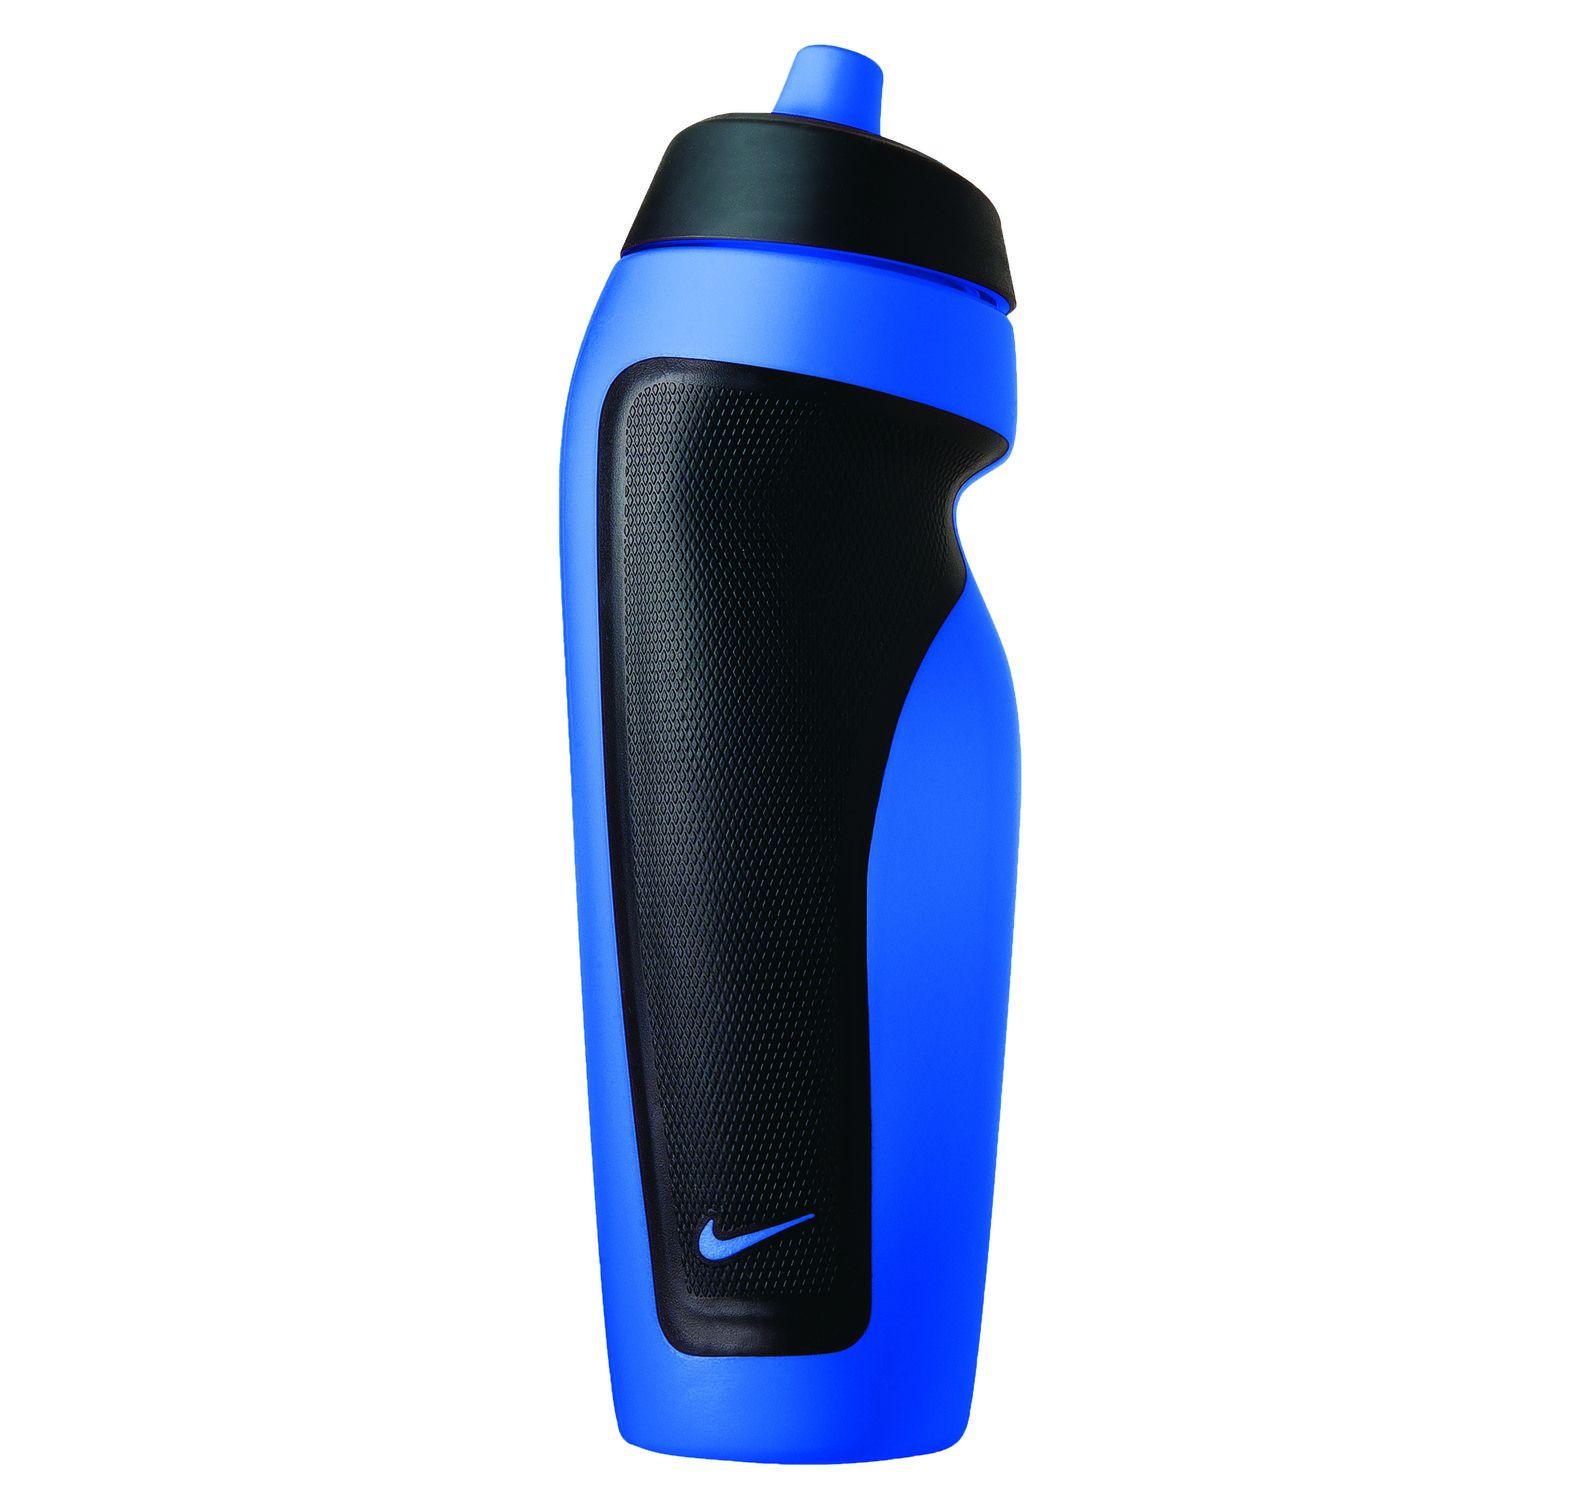 Nike Sport Water Bottle, Game Royal/Black, Onesize, Nike